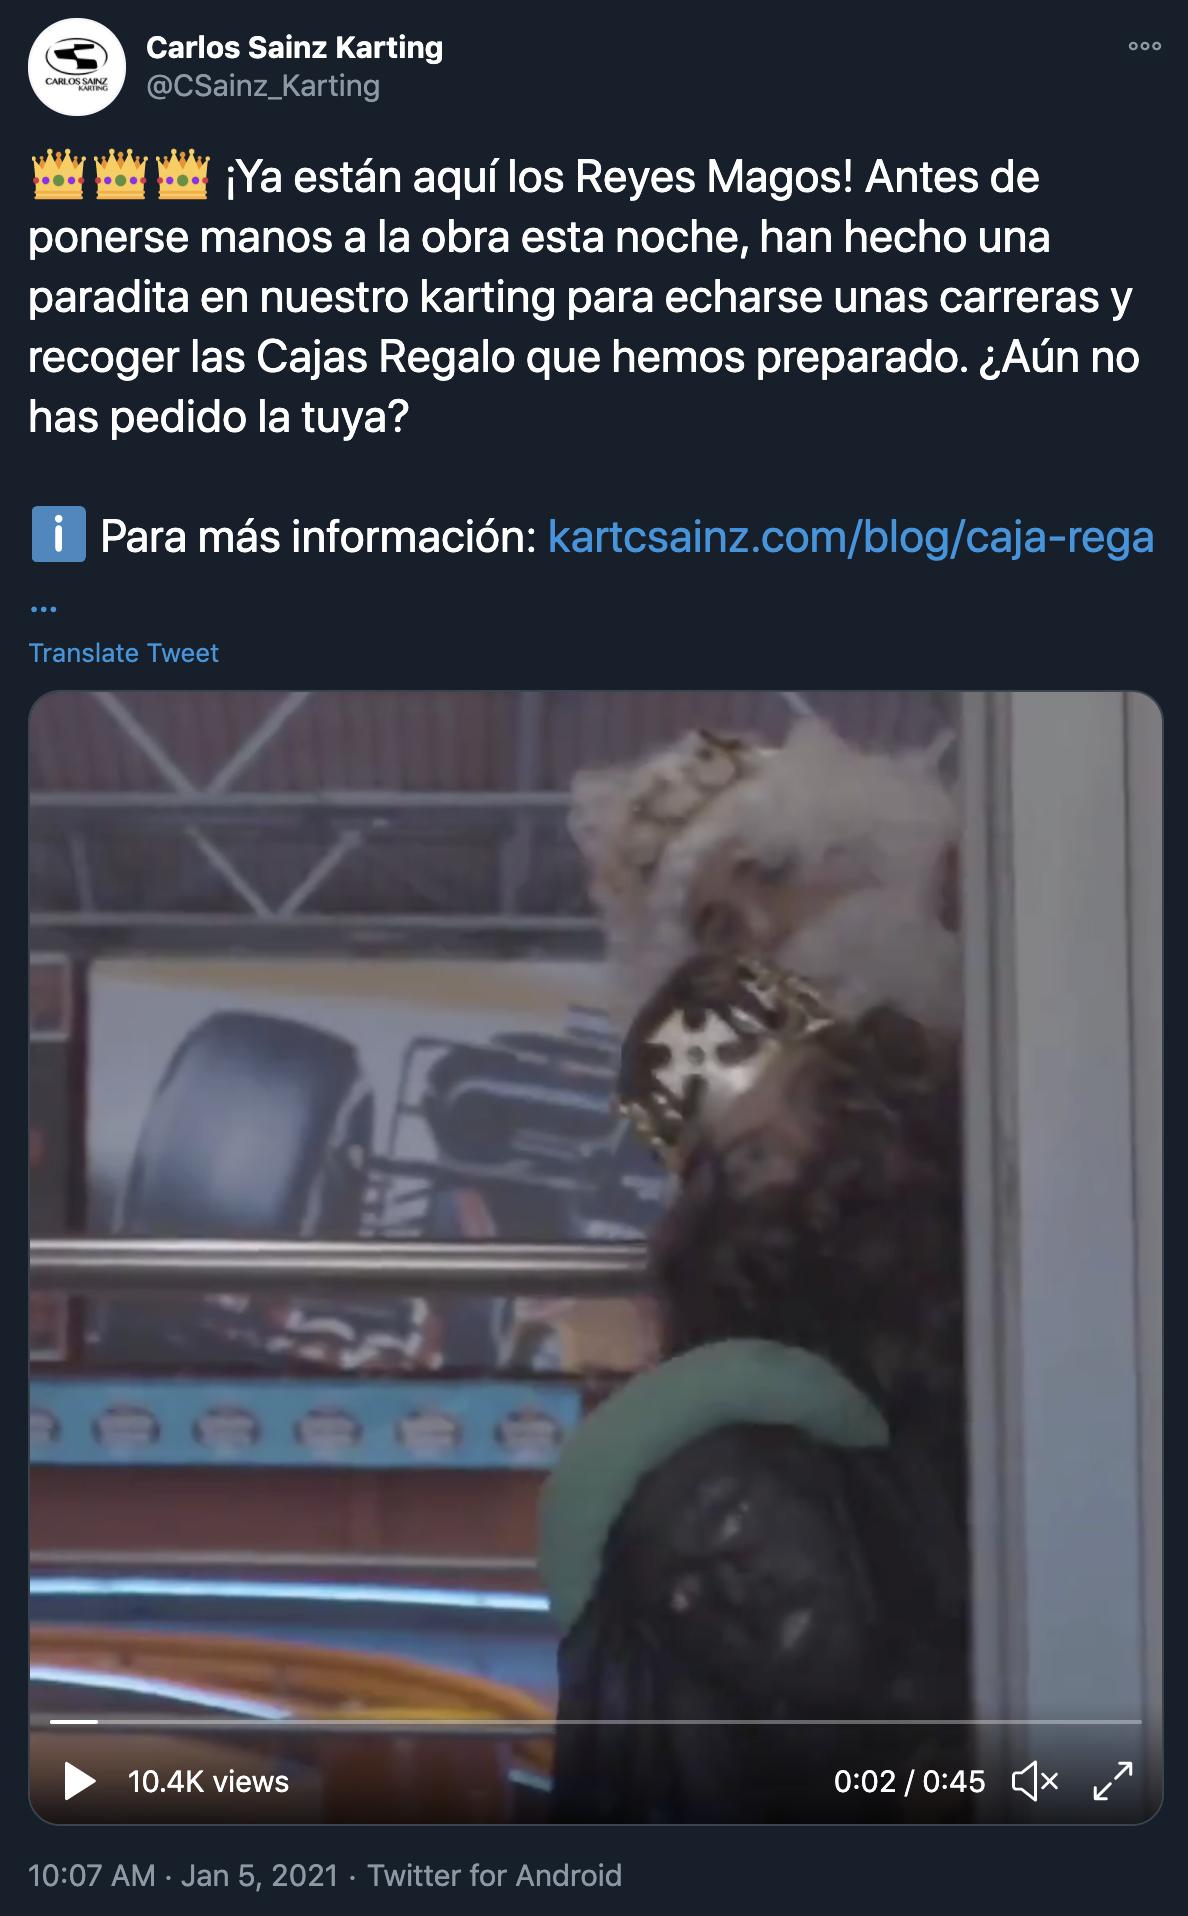 Carlos Sainz Karting Blackface Tweet